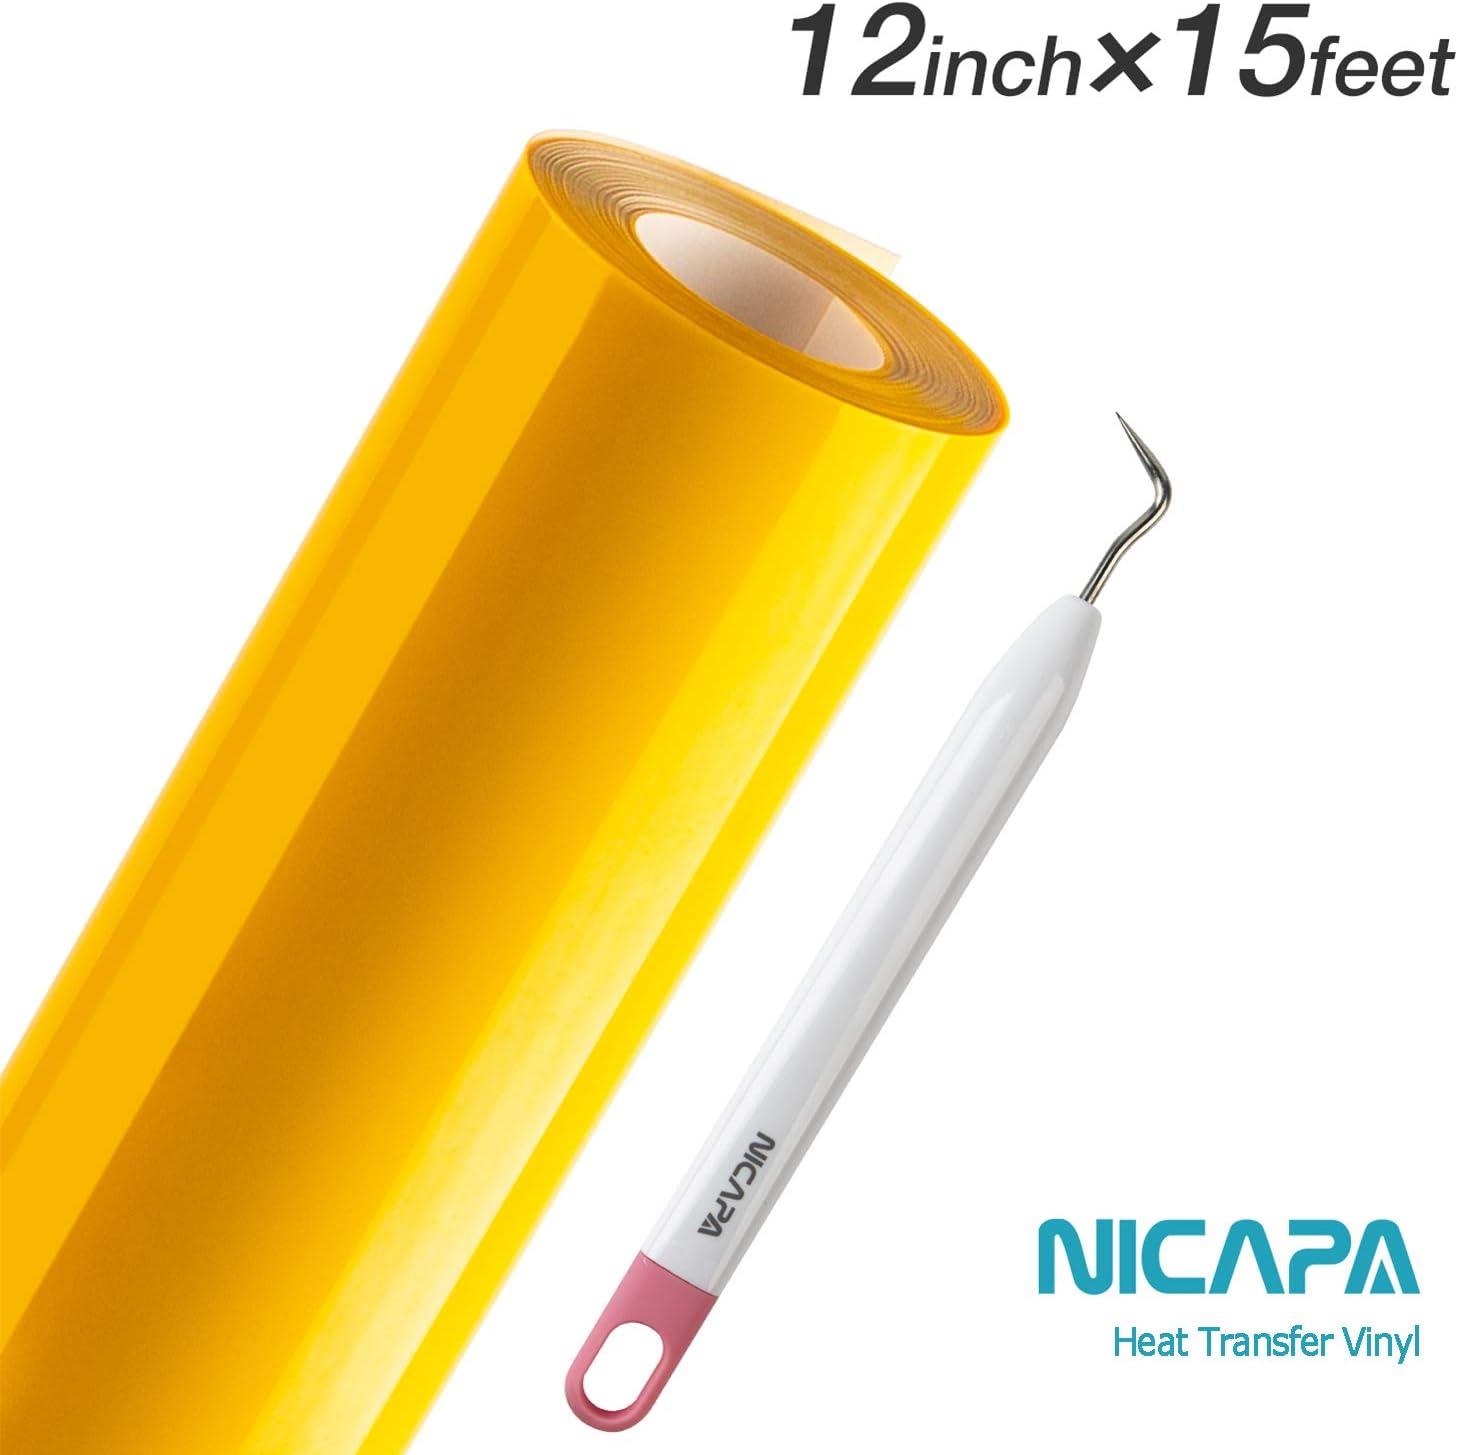 Nicapa 12inch x15feet Heat Transfer Vinyl Roll for Cricut/&Silhouette T-Shirt Art